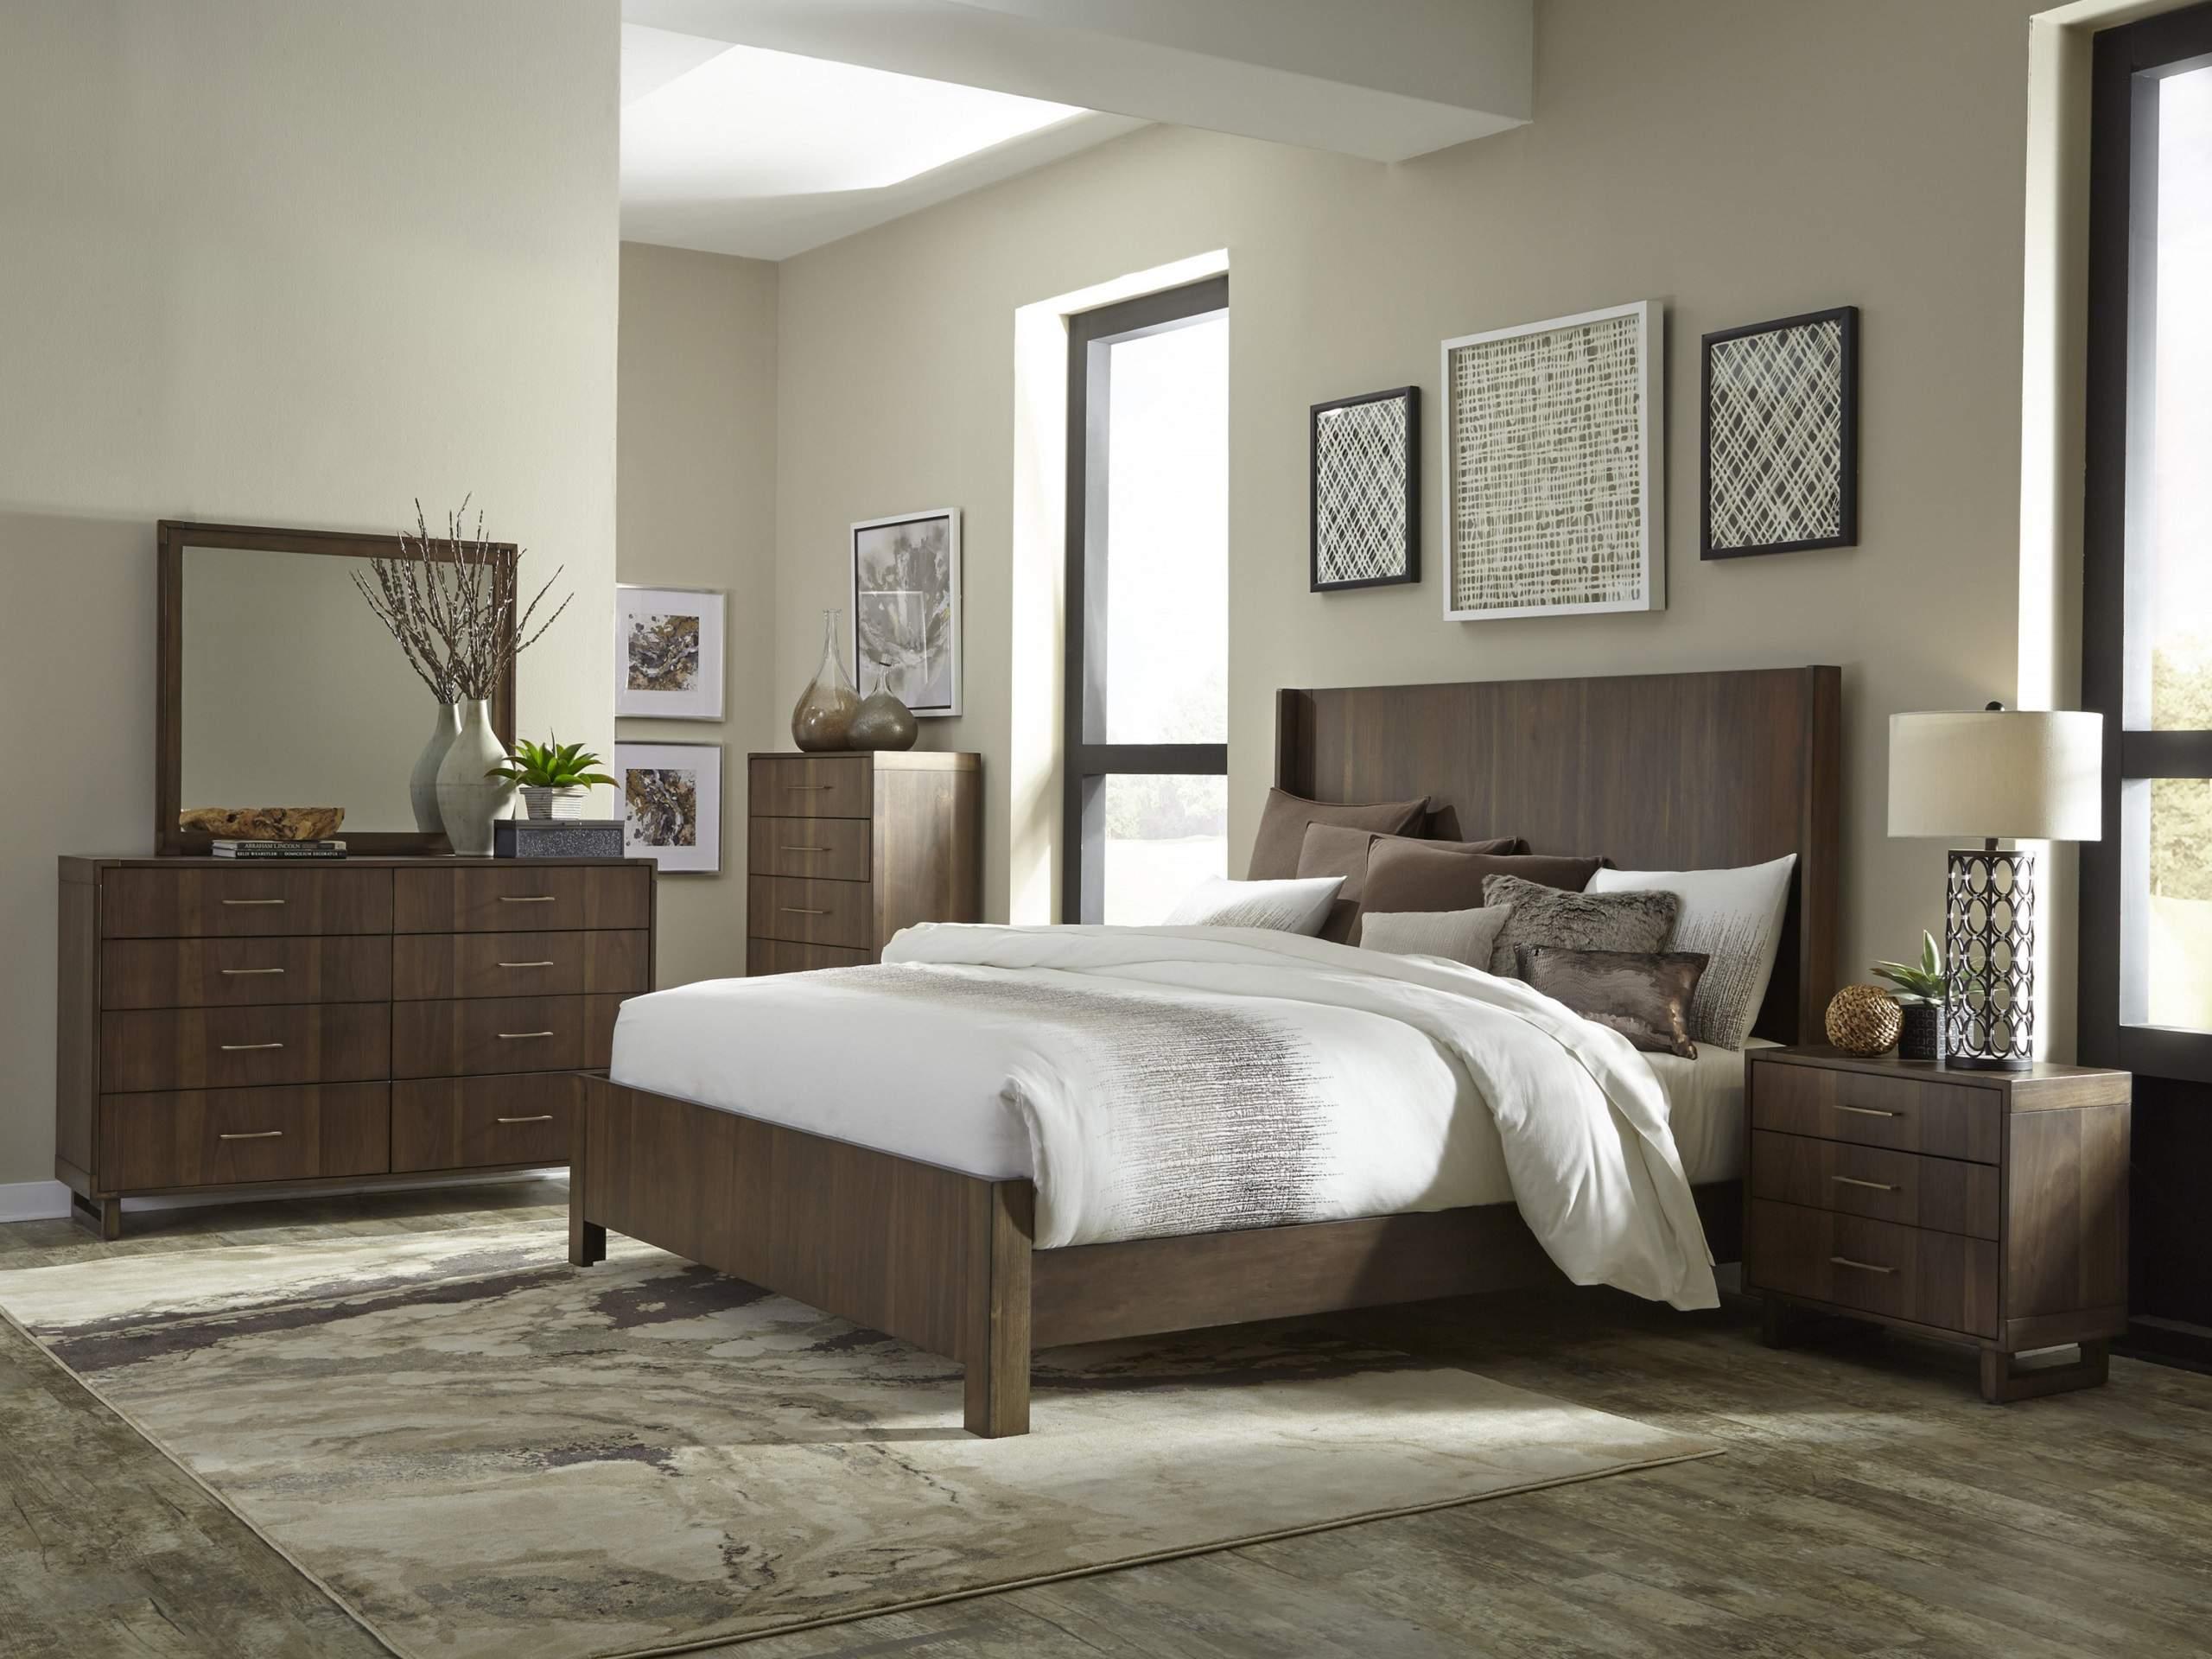 CATALONIA Bed Set